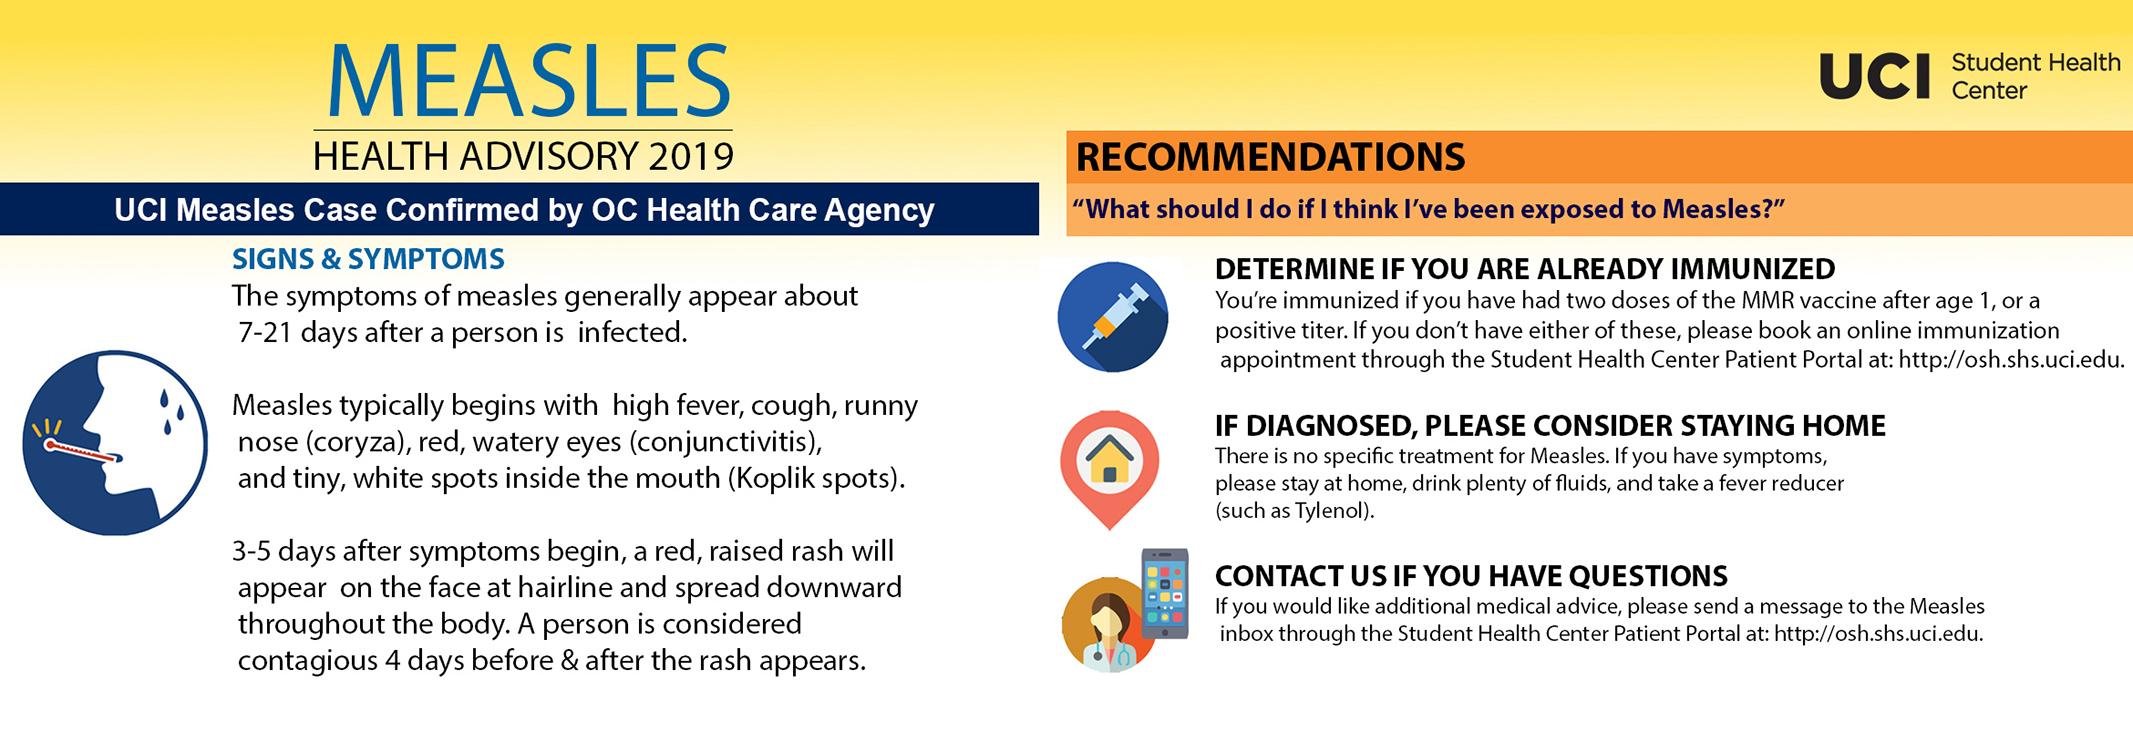 Student Health Center Measles Health Advisory 2019